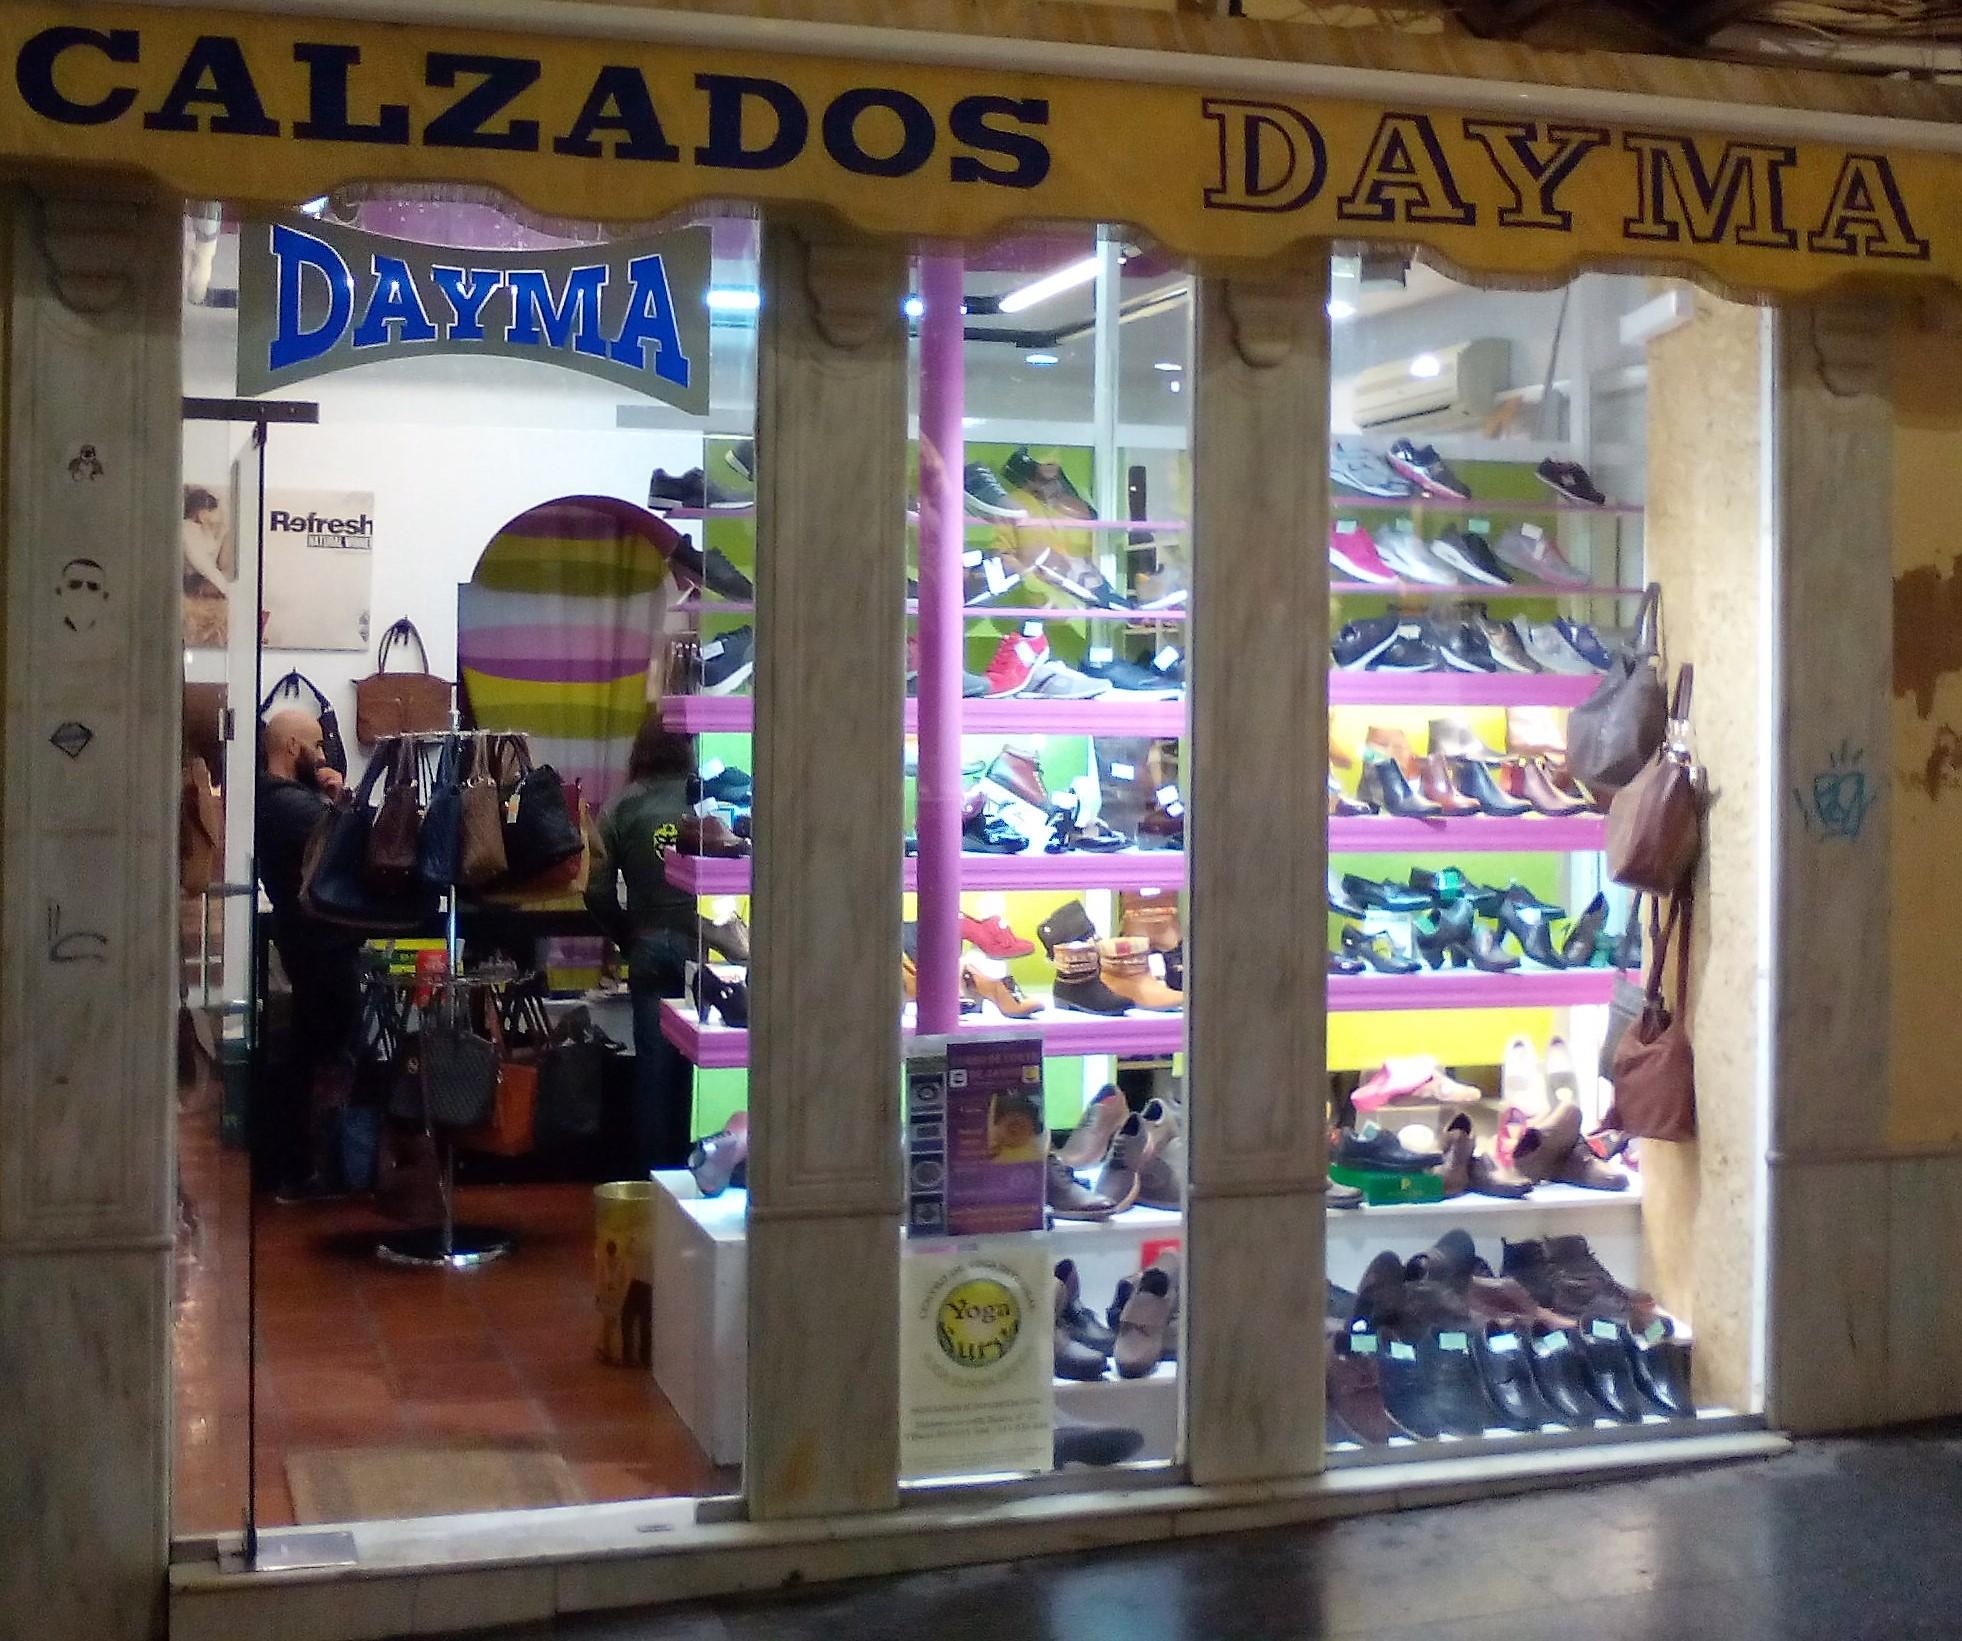 Zapateria Zafra Dayma - calzados